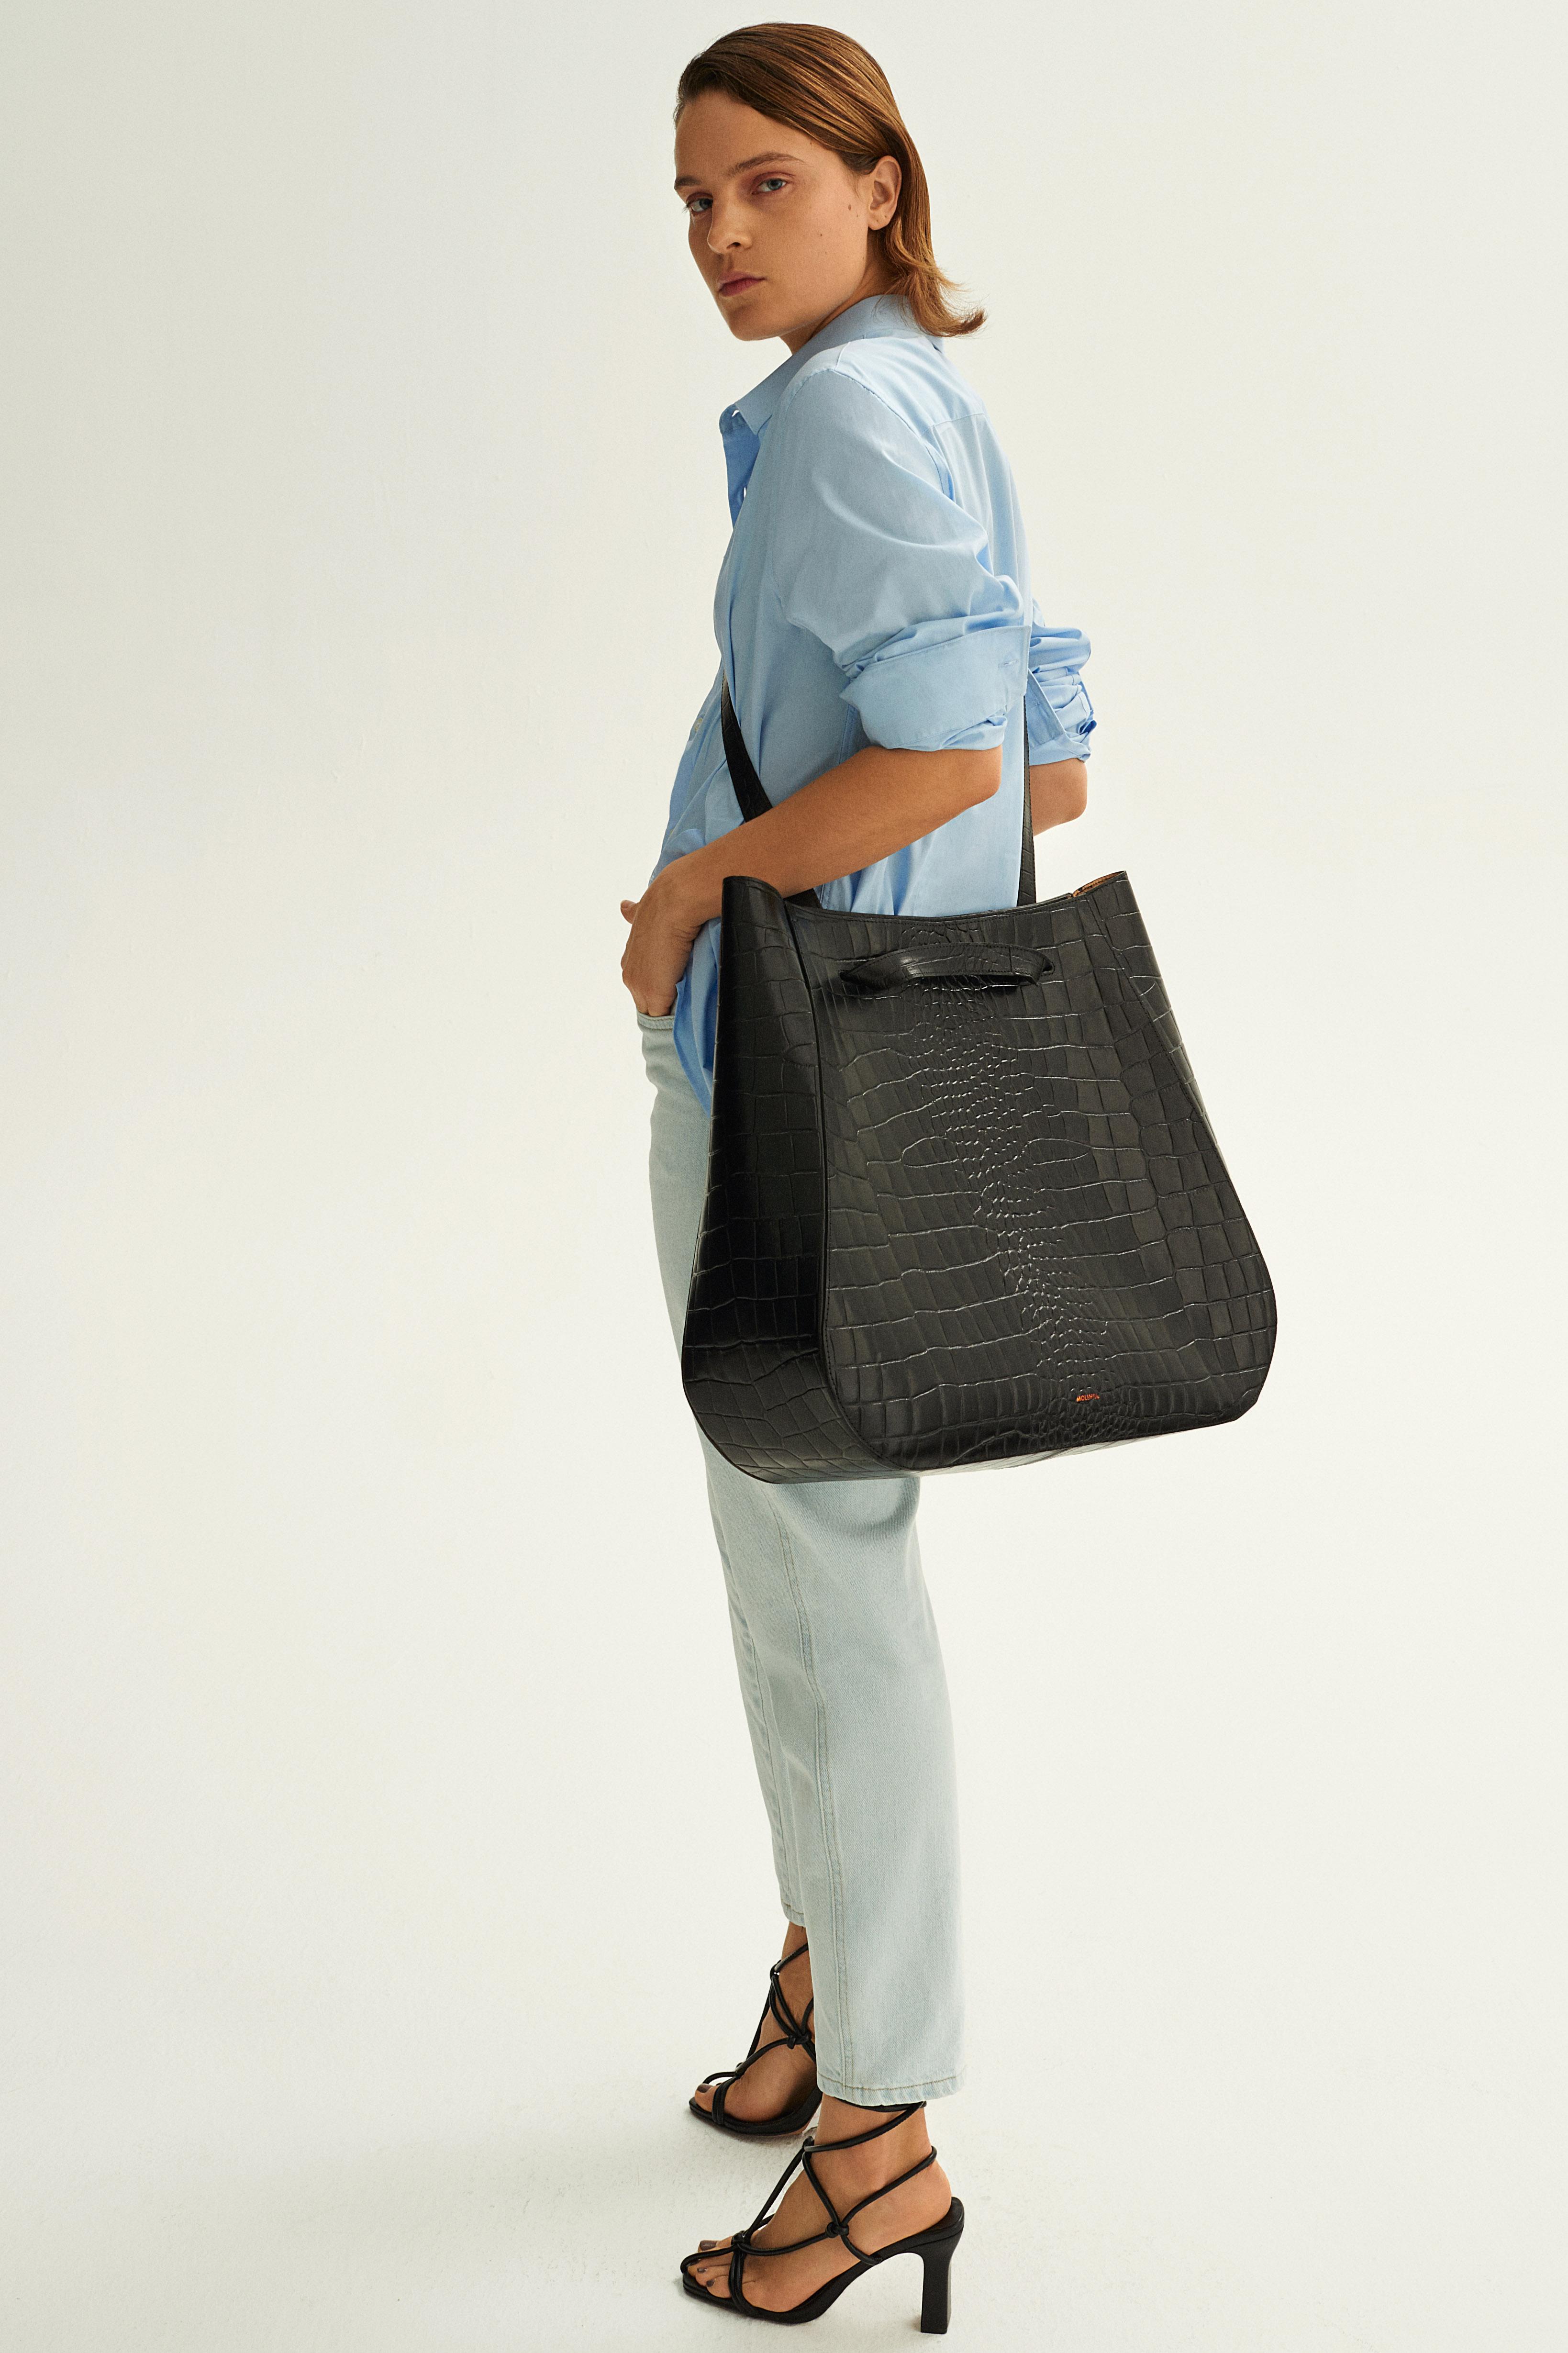 Molehill-Lookbook-Lesa-Large-Handbag-Croco-Black-Special-Edition